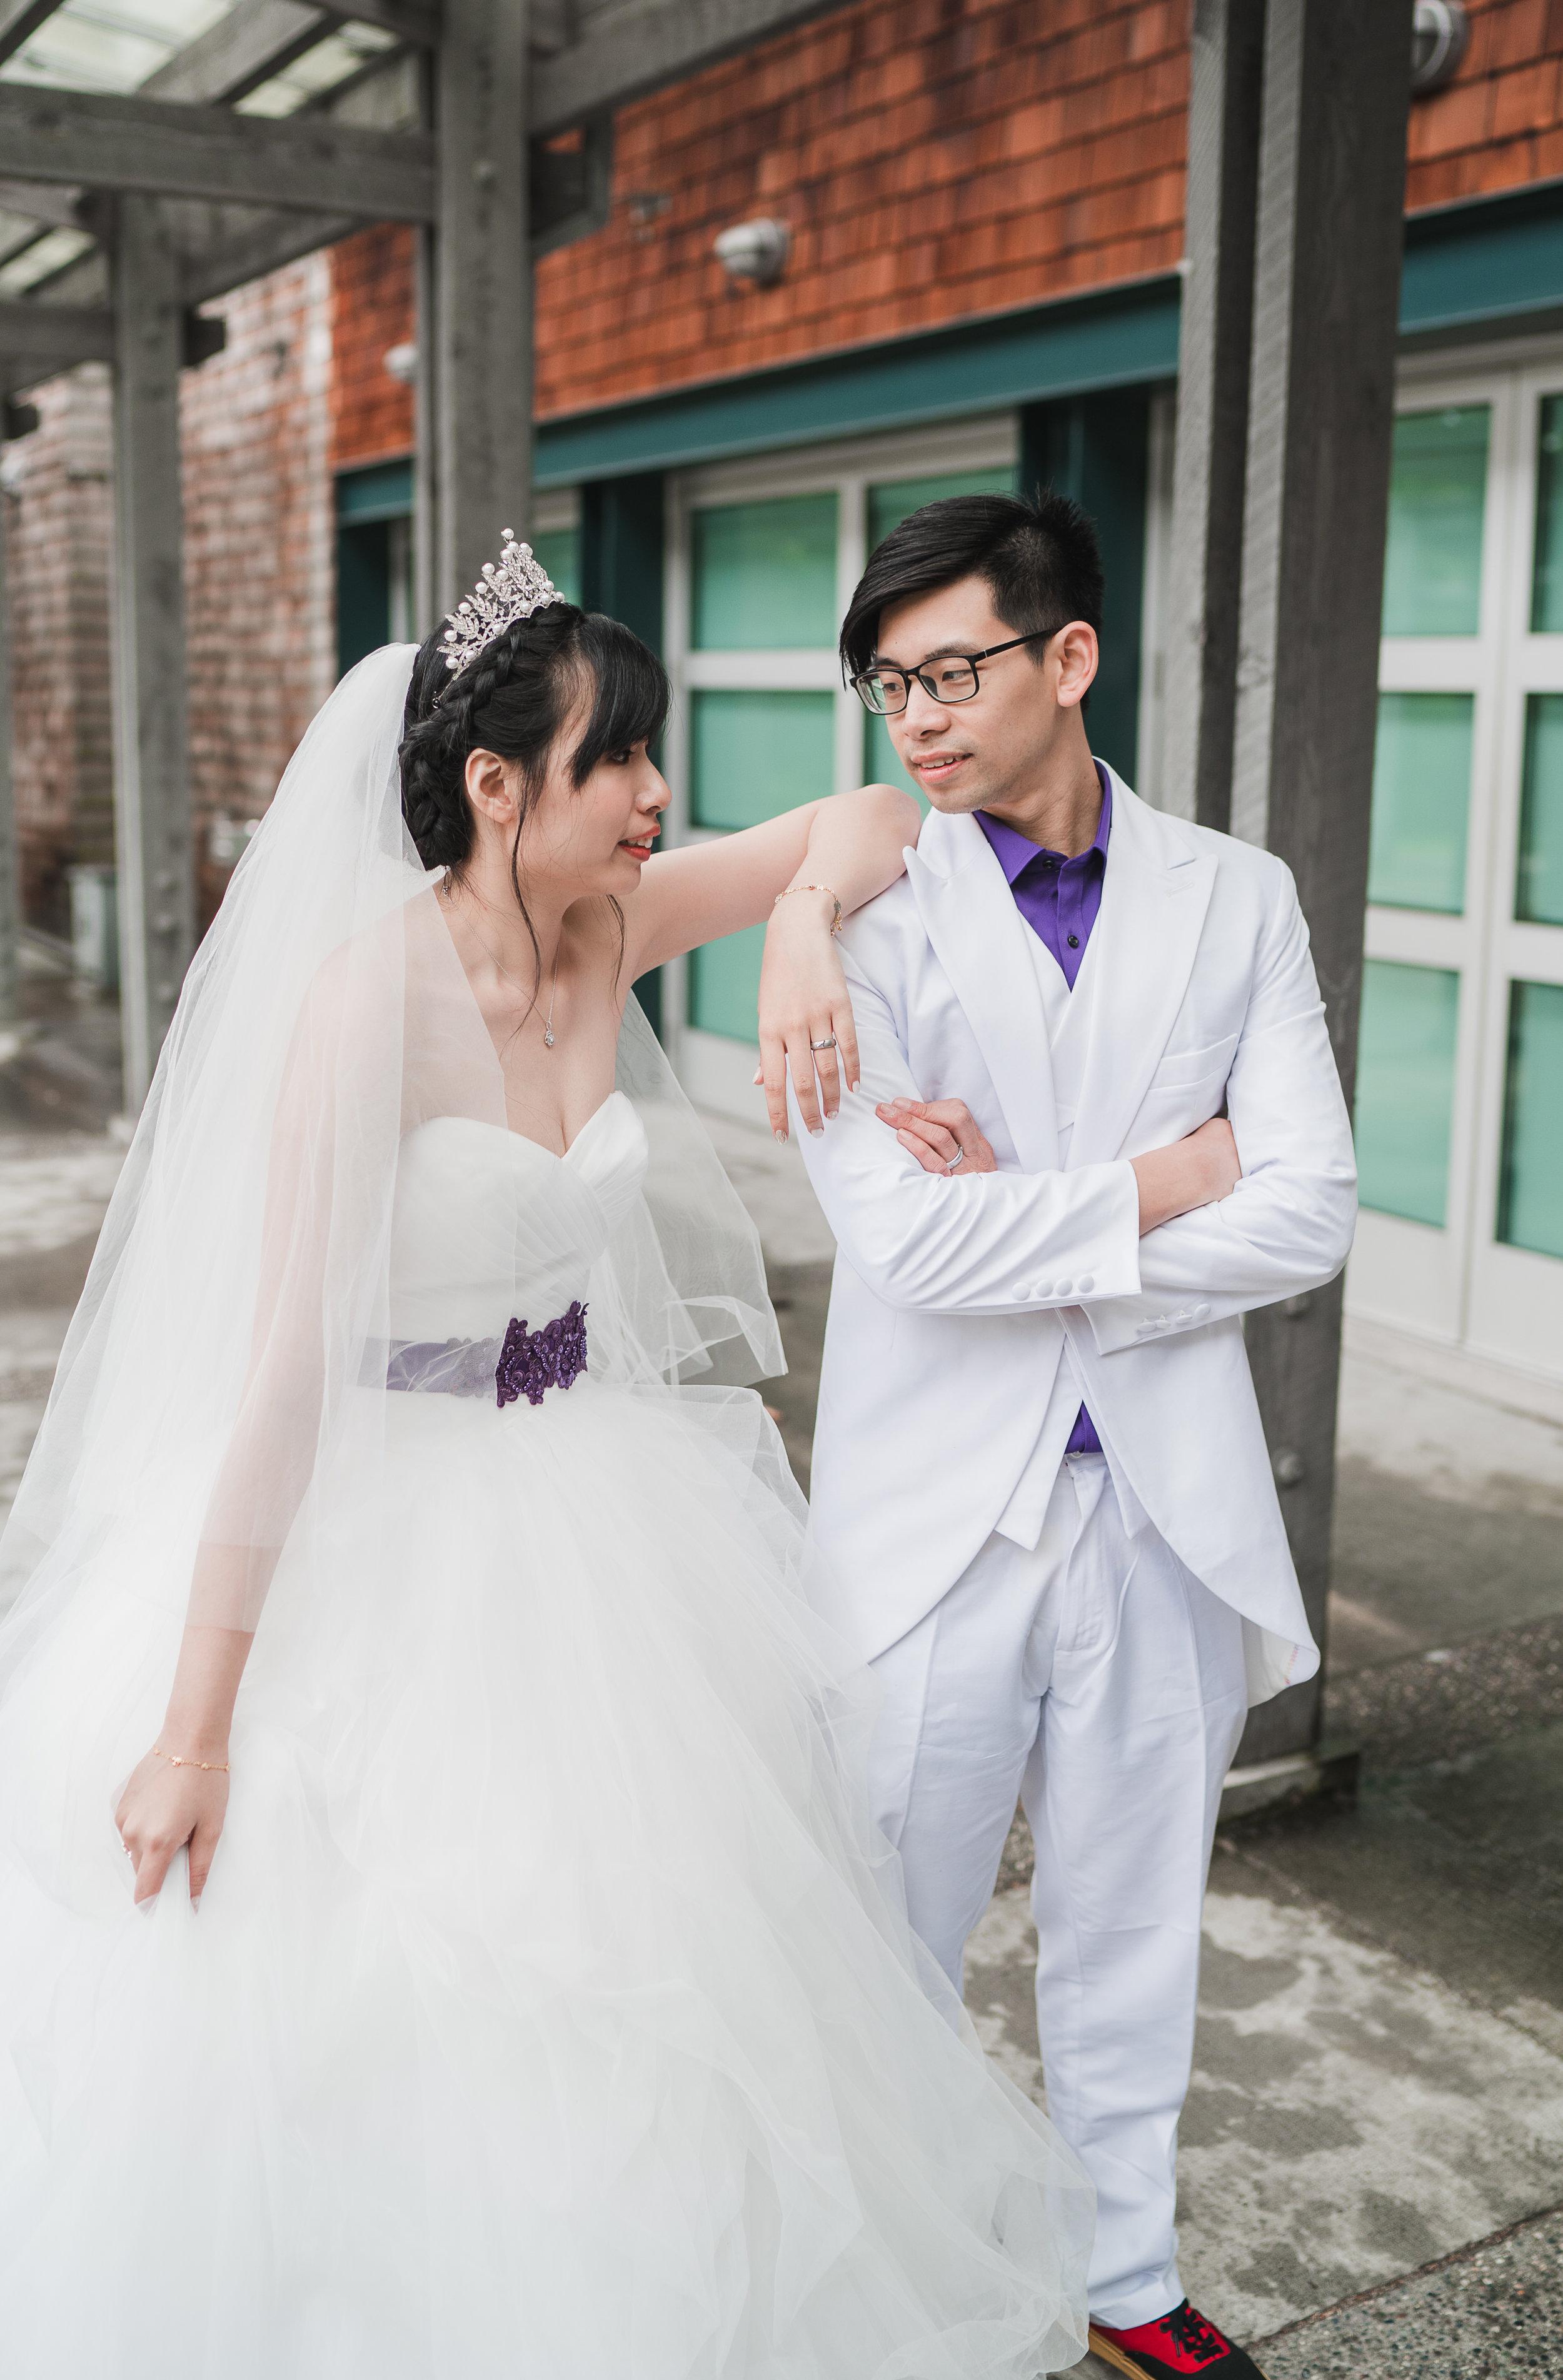 20190520 - Pamela & Matthew Wedding- 0718.jpg